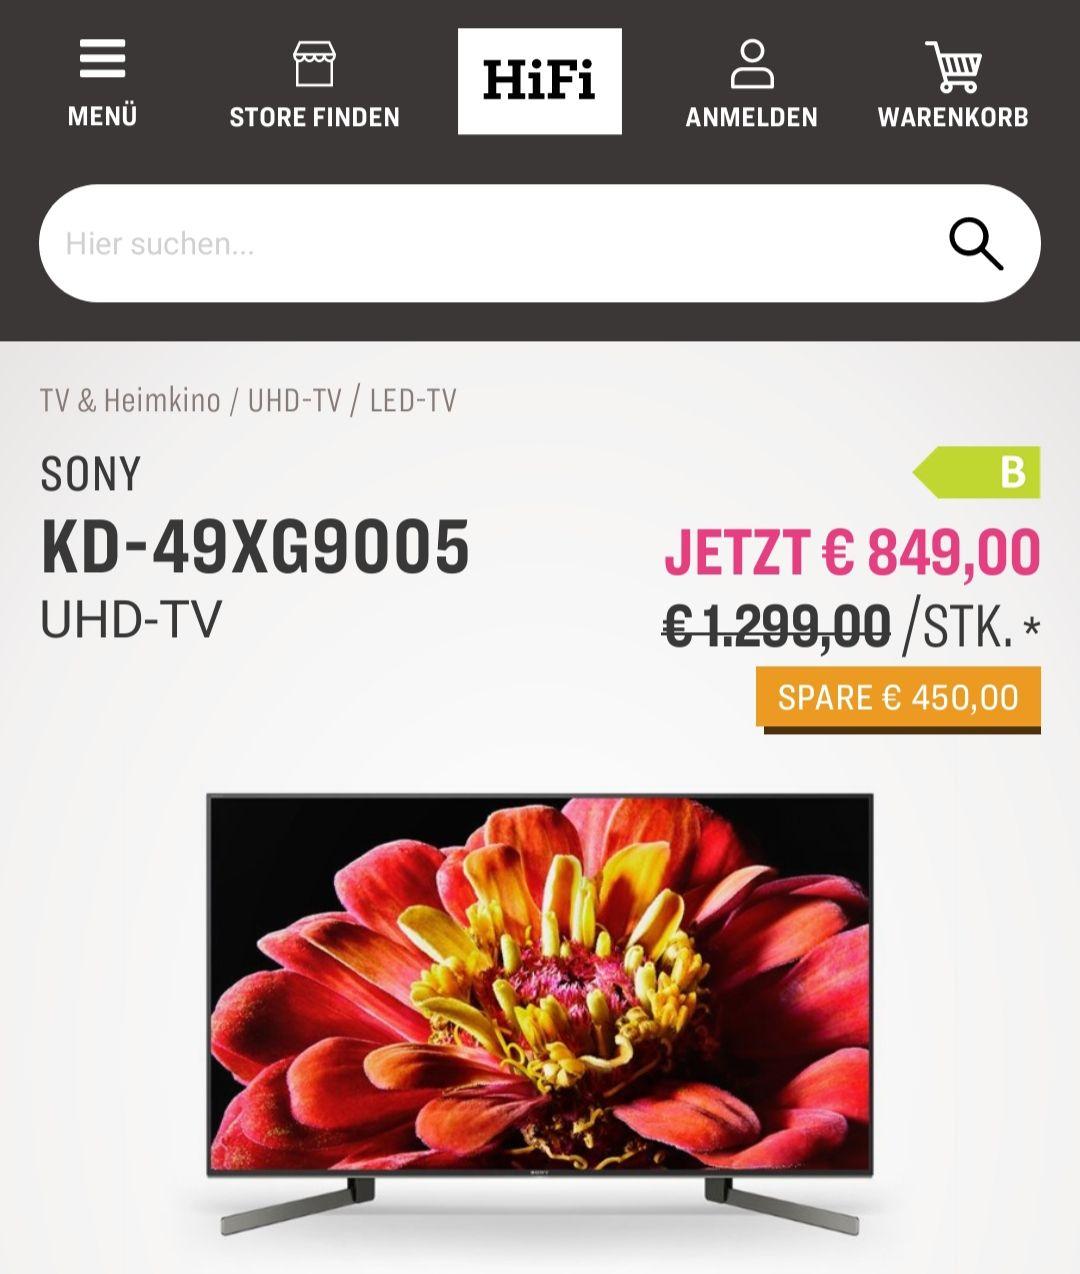 Sony KD-49XG9005 inkl. 5 Jahre Garantie - 4K Fernseher TV HiFi Klubben Online